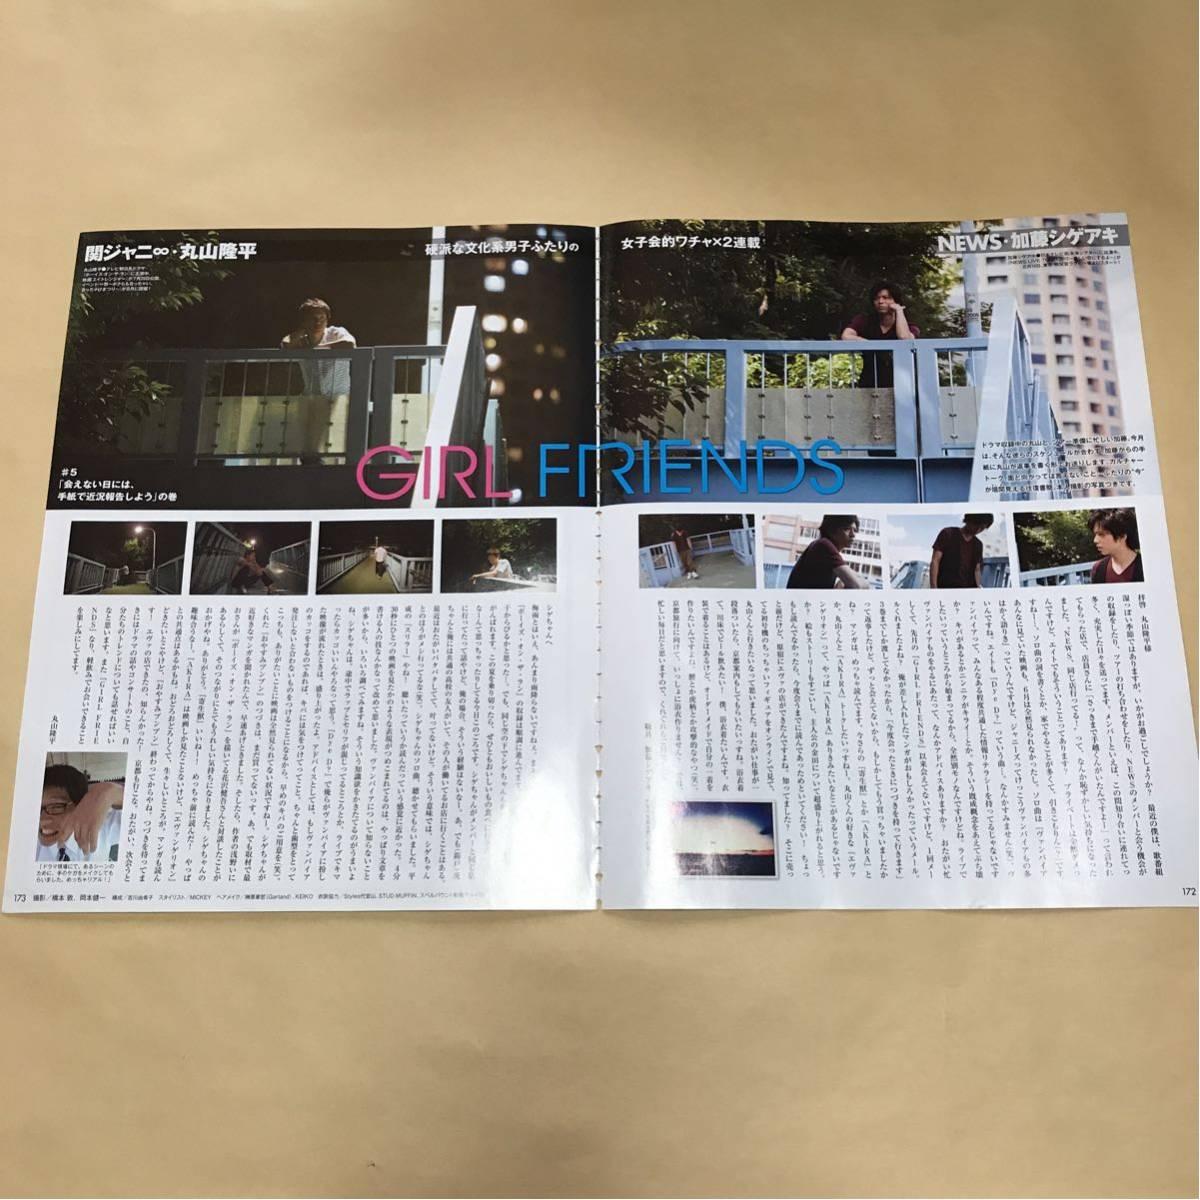 明星 丸山隆平×加藤シゲアキ 連載 GIRL FRIENDS 9回分 2013年中心